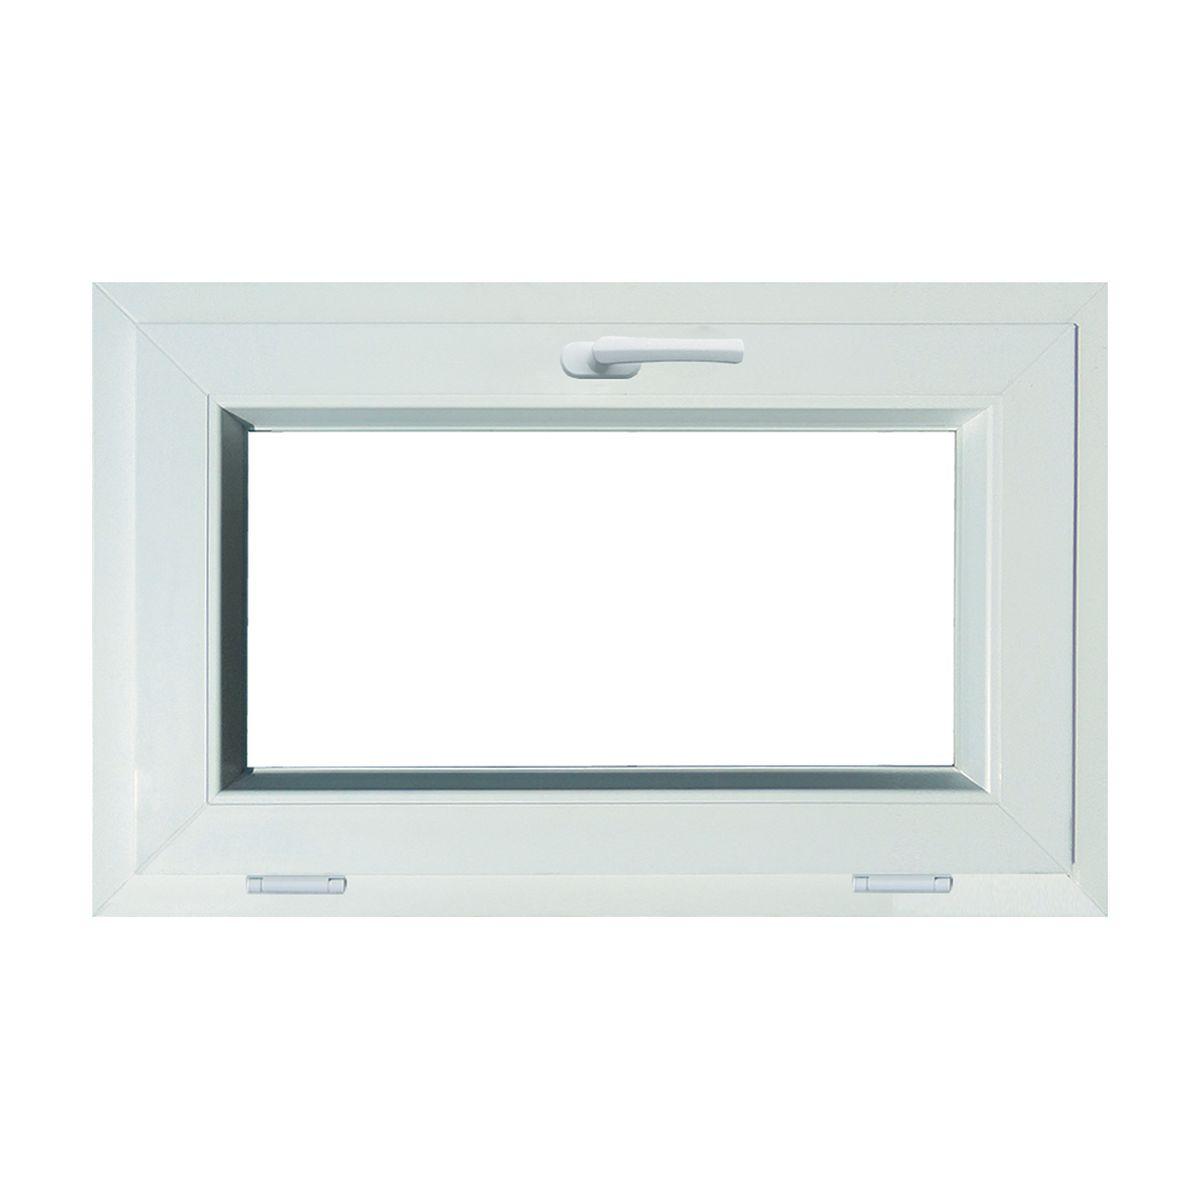 finestre pvc misure standard great finestre pvc in offerta with finestre pvc misure standard. Black Bedroom Furniture Sets. Home Design Ideas